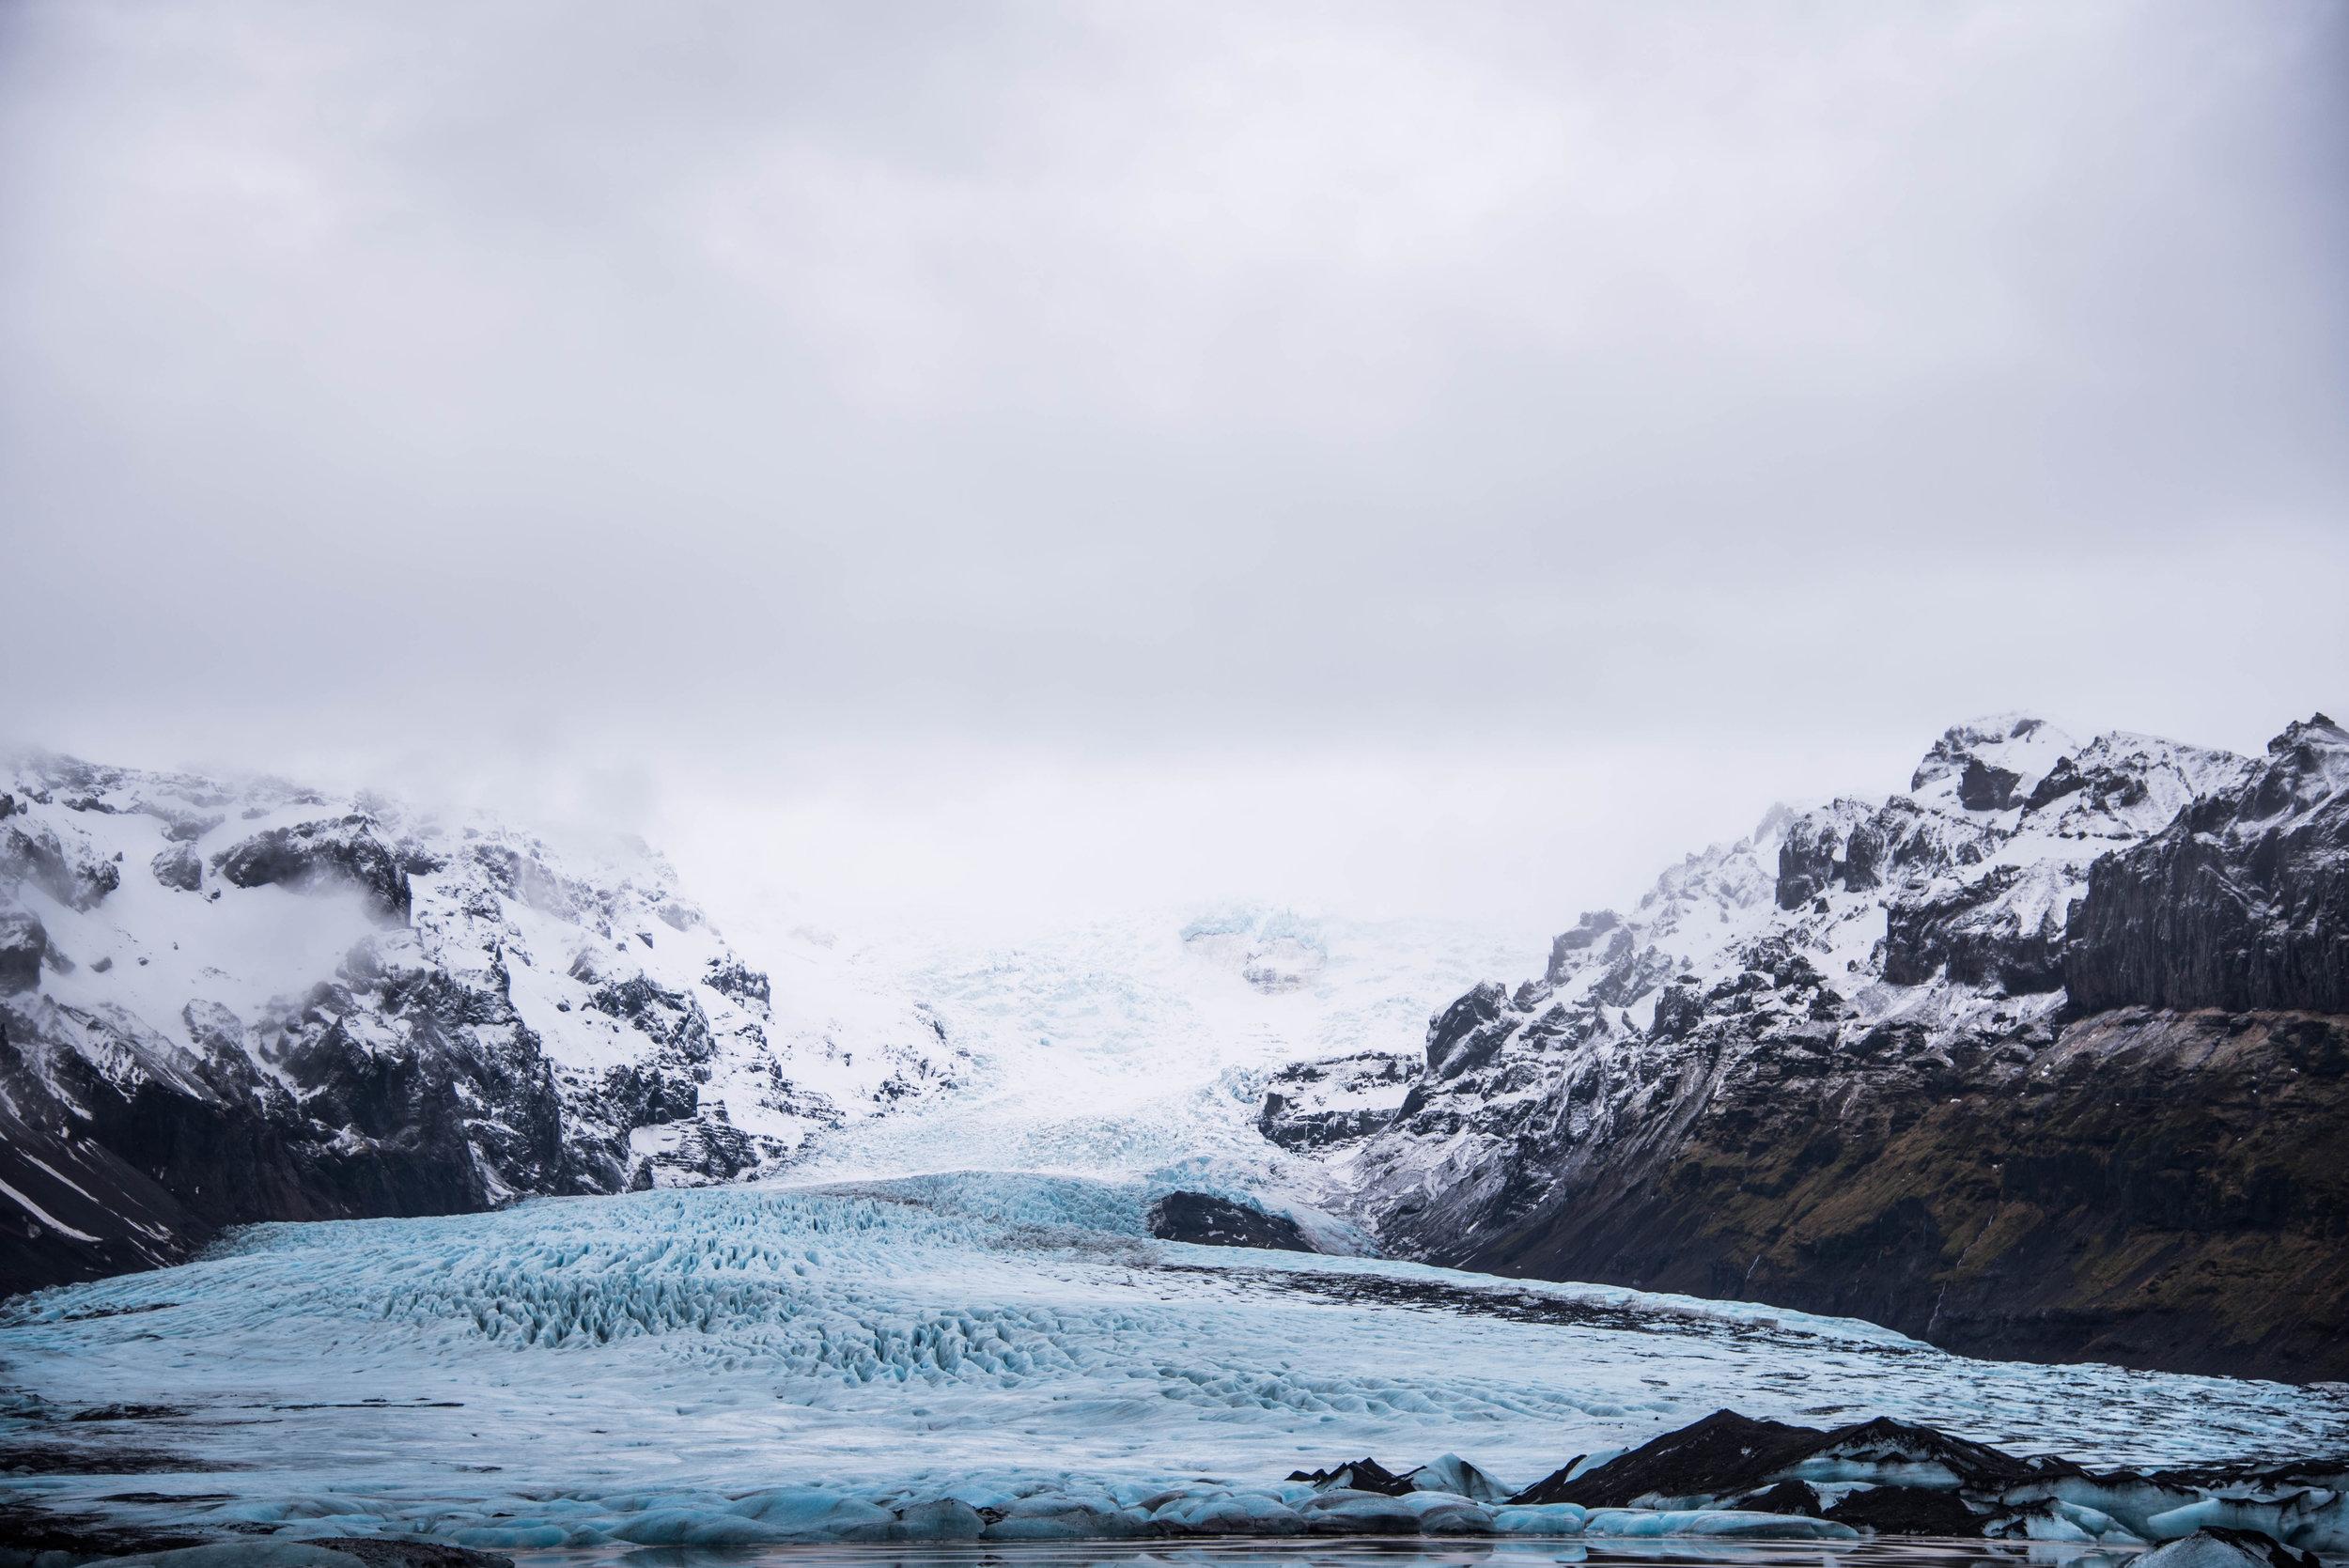 ROSE & IVY Journal Escape to Iceland Kvíamýrarkambur